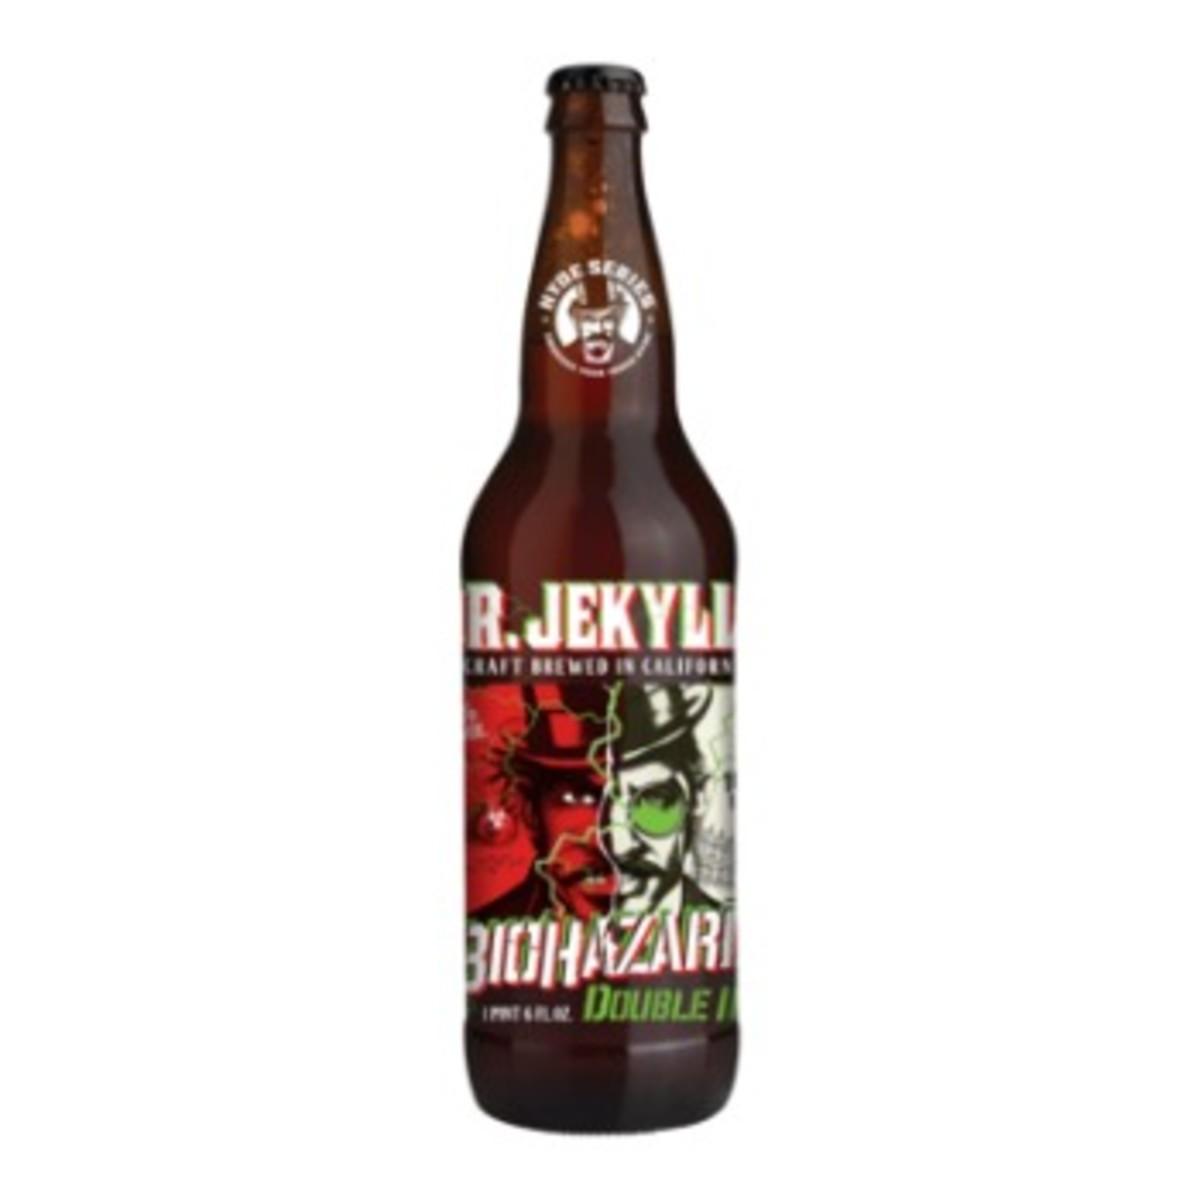 Dr. Jekyll's Organic Beer